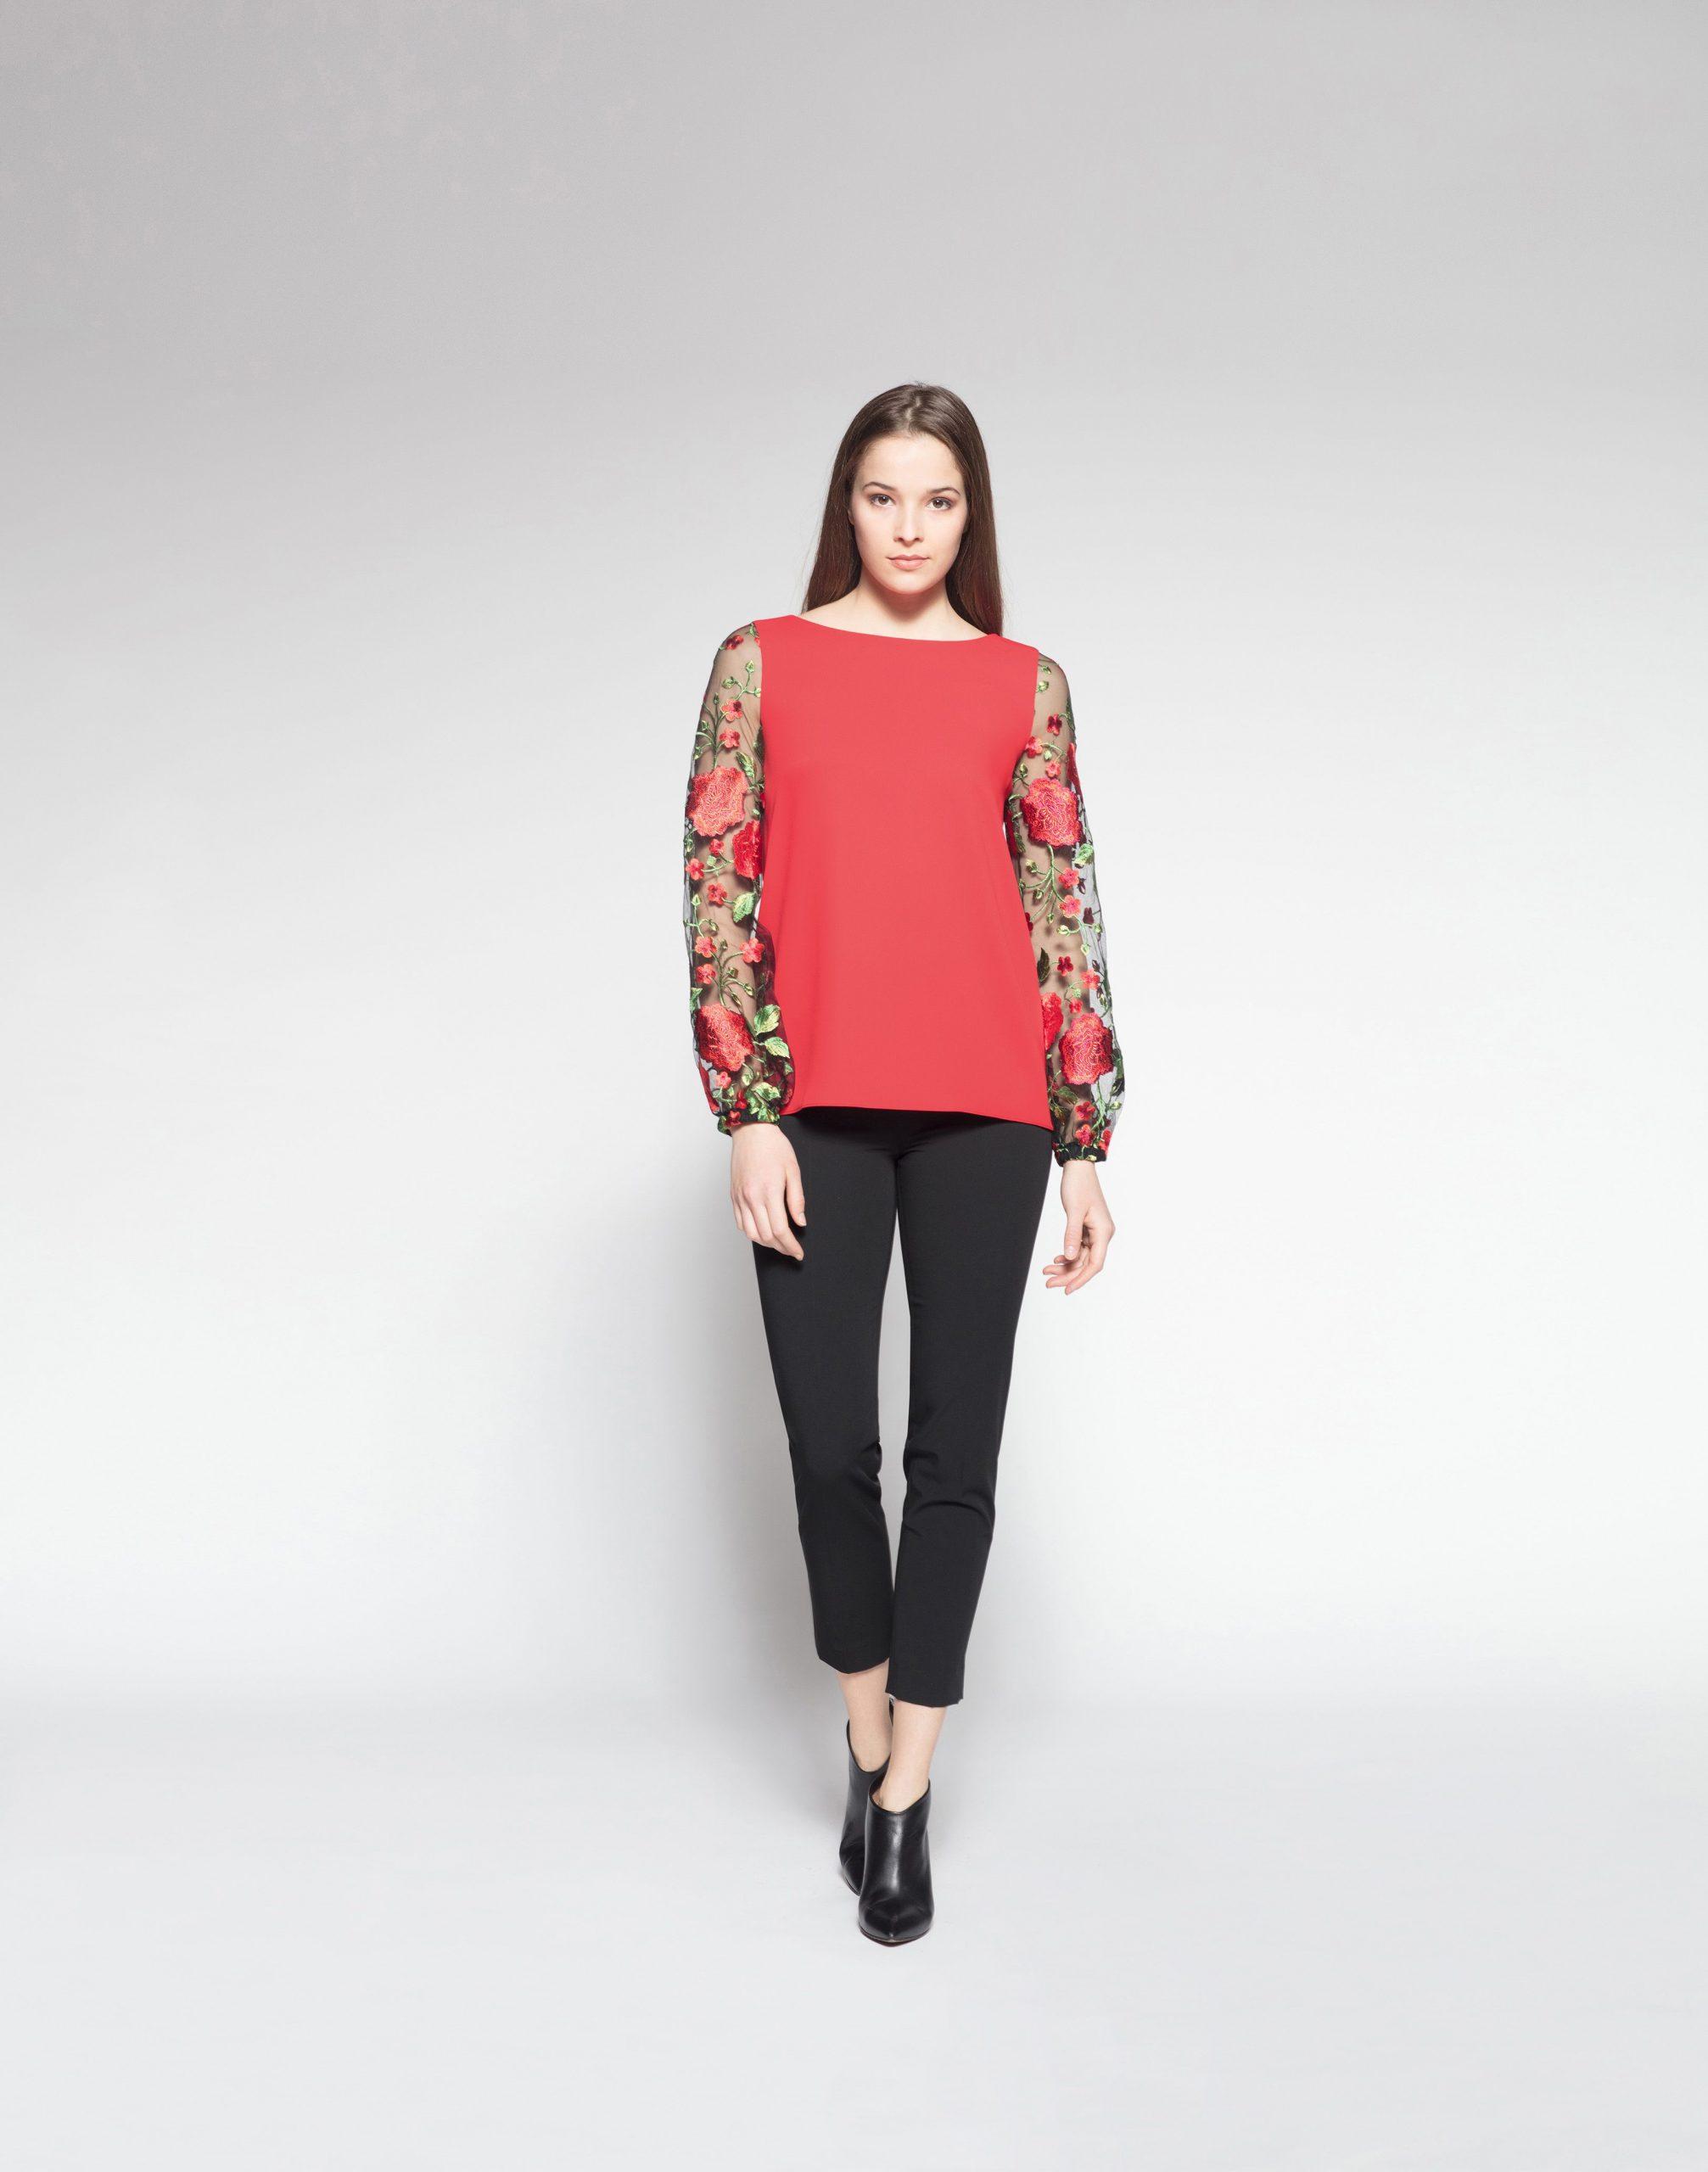 Piu  Piu Winter 2018 Bluse Rot Blüten Transparent Mit